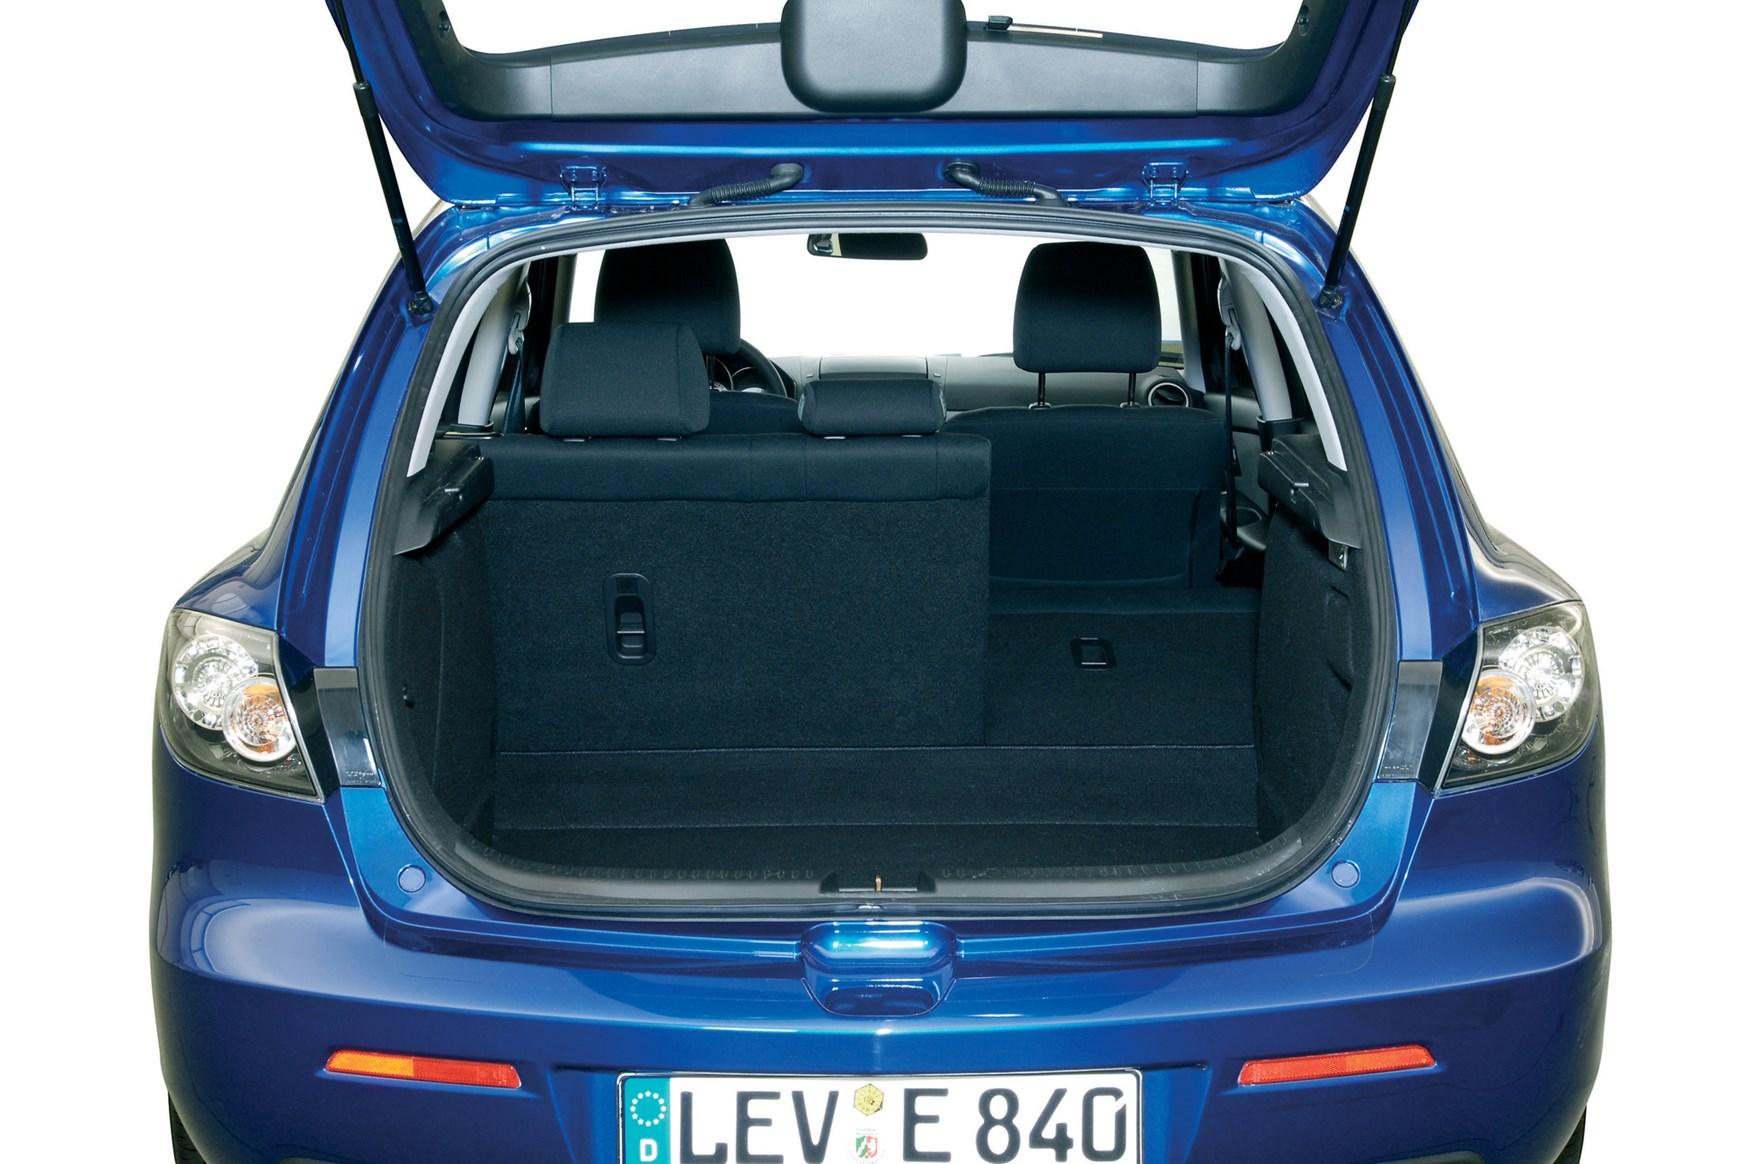 Mazda 3 hatchback review 2004 2008 parkers - 2004 mazda 3 interior accessories ...